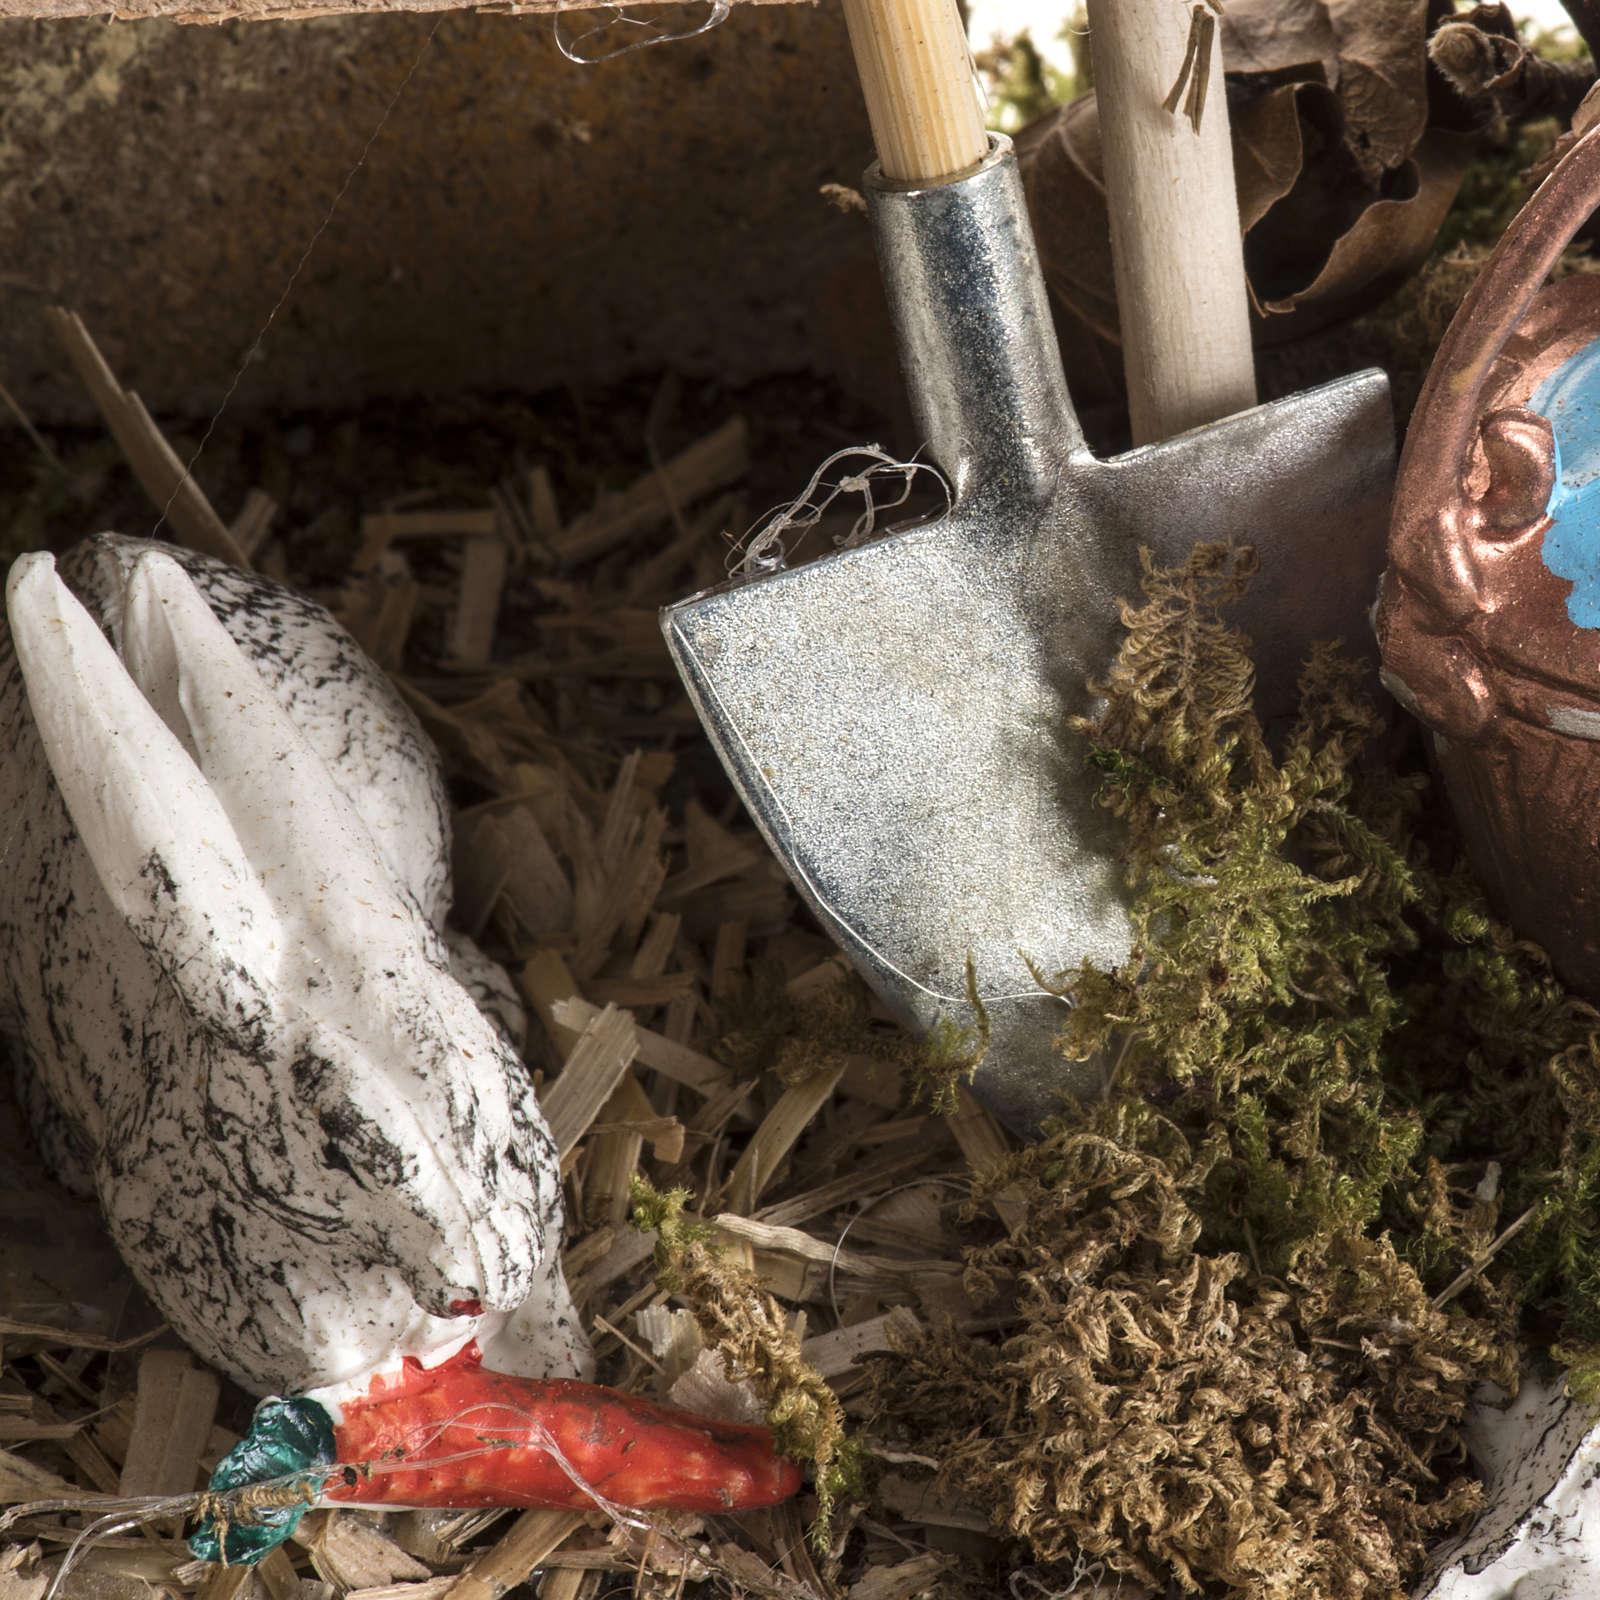 Nativity scene figurines, rabbits and setting 3